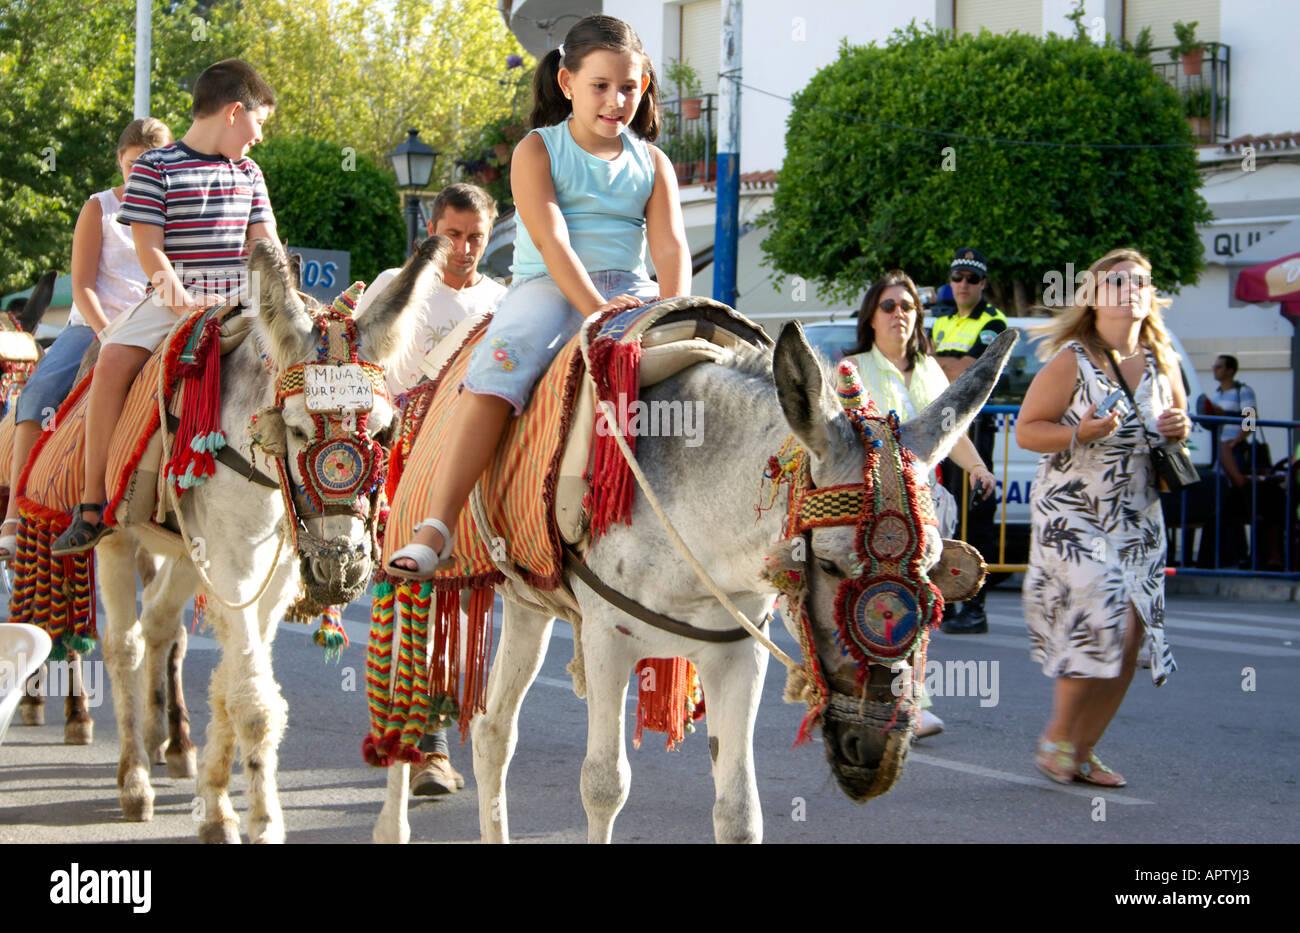 Children riding donkeys, Mijas Pueblo, Andalucia, Spain - Stock Image